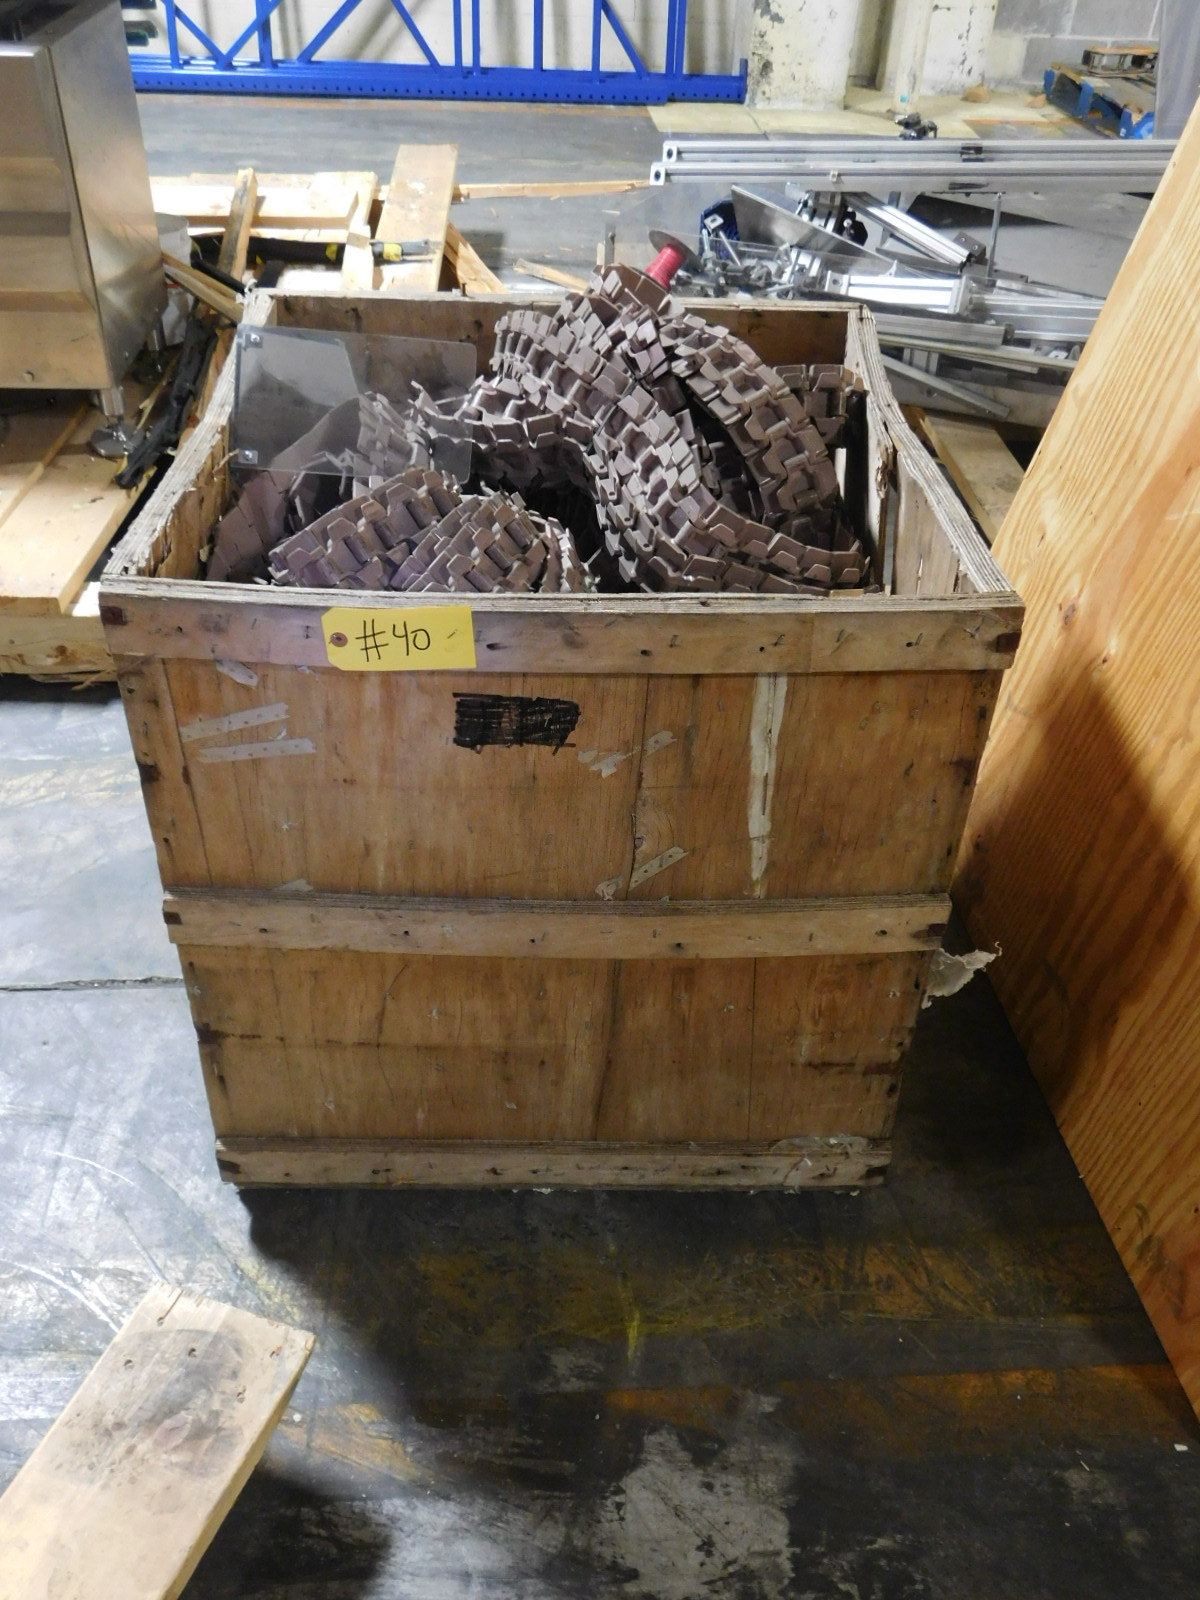 Lot 40 - Macbett 879TK326 Table top chain est, 100 Feet :equipment located at Clark Logistic Services |314-